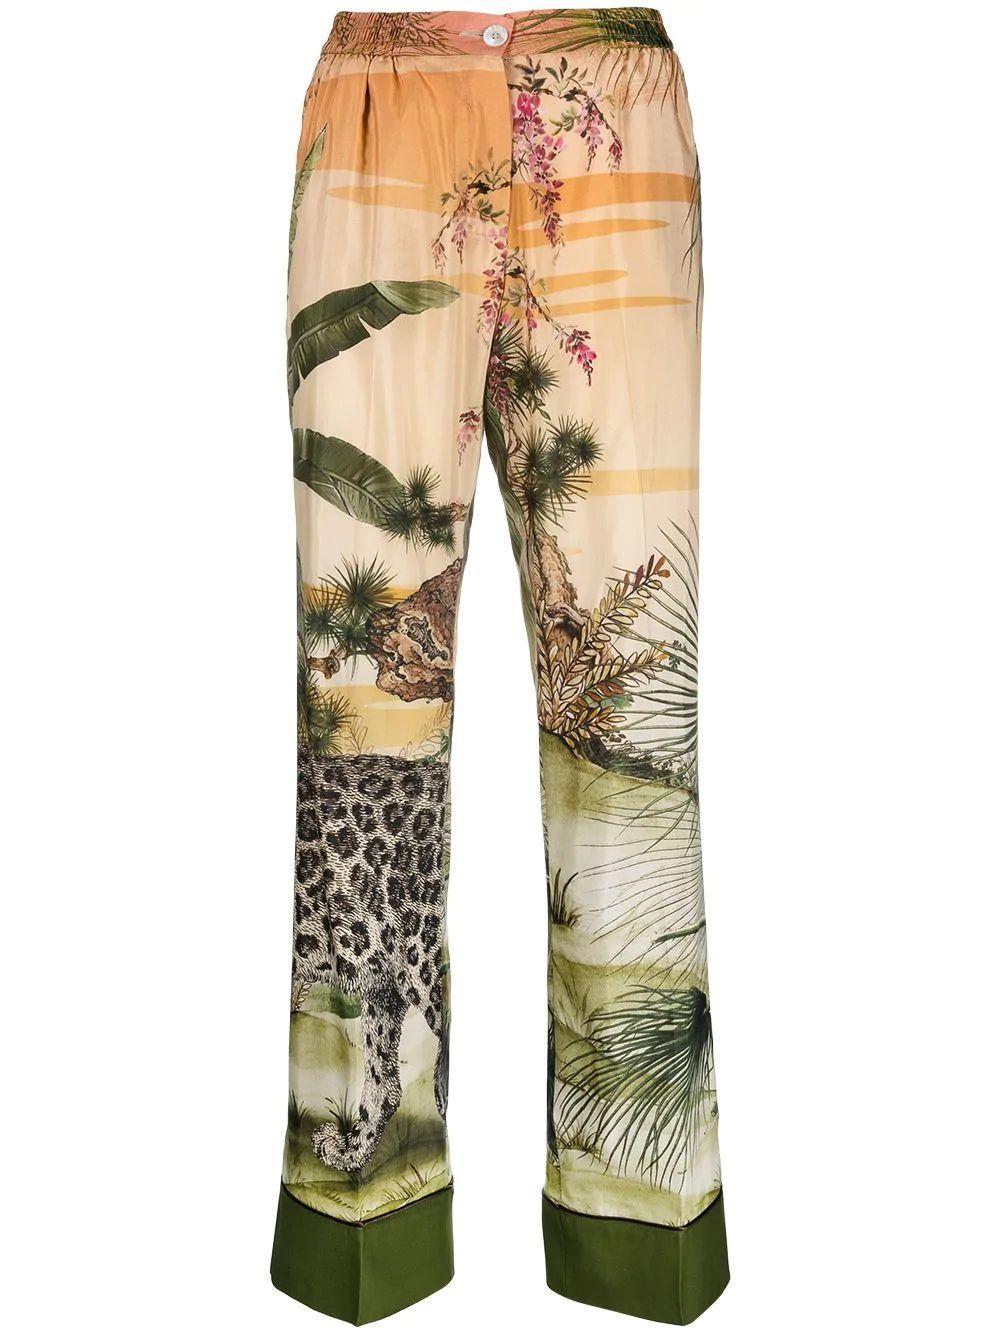 Alimede Jungle Print Pant